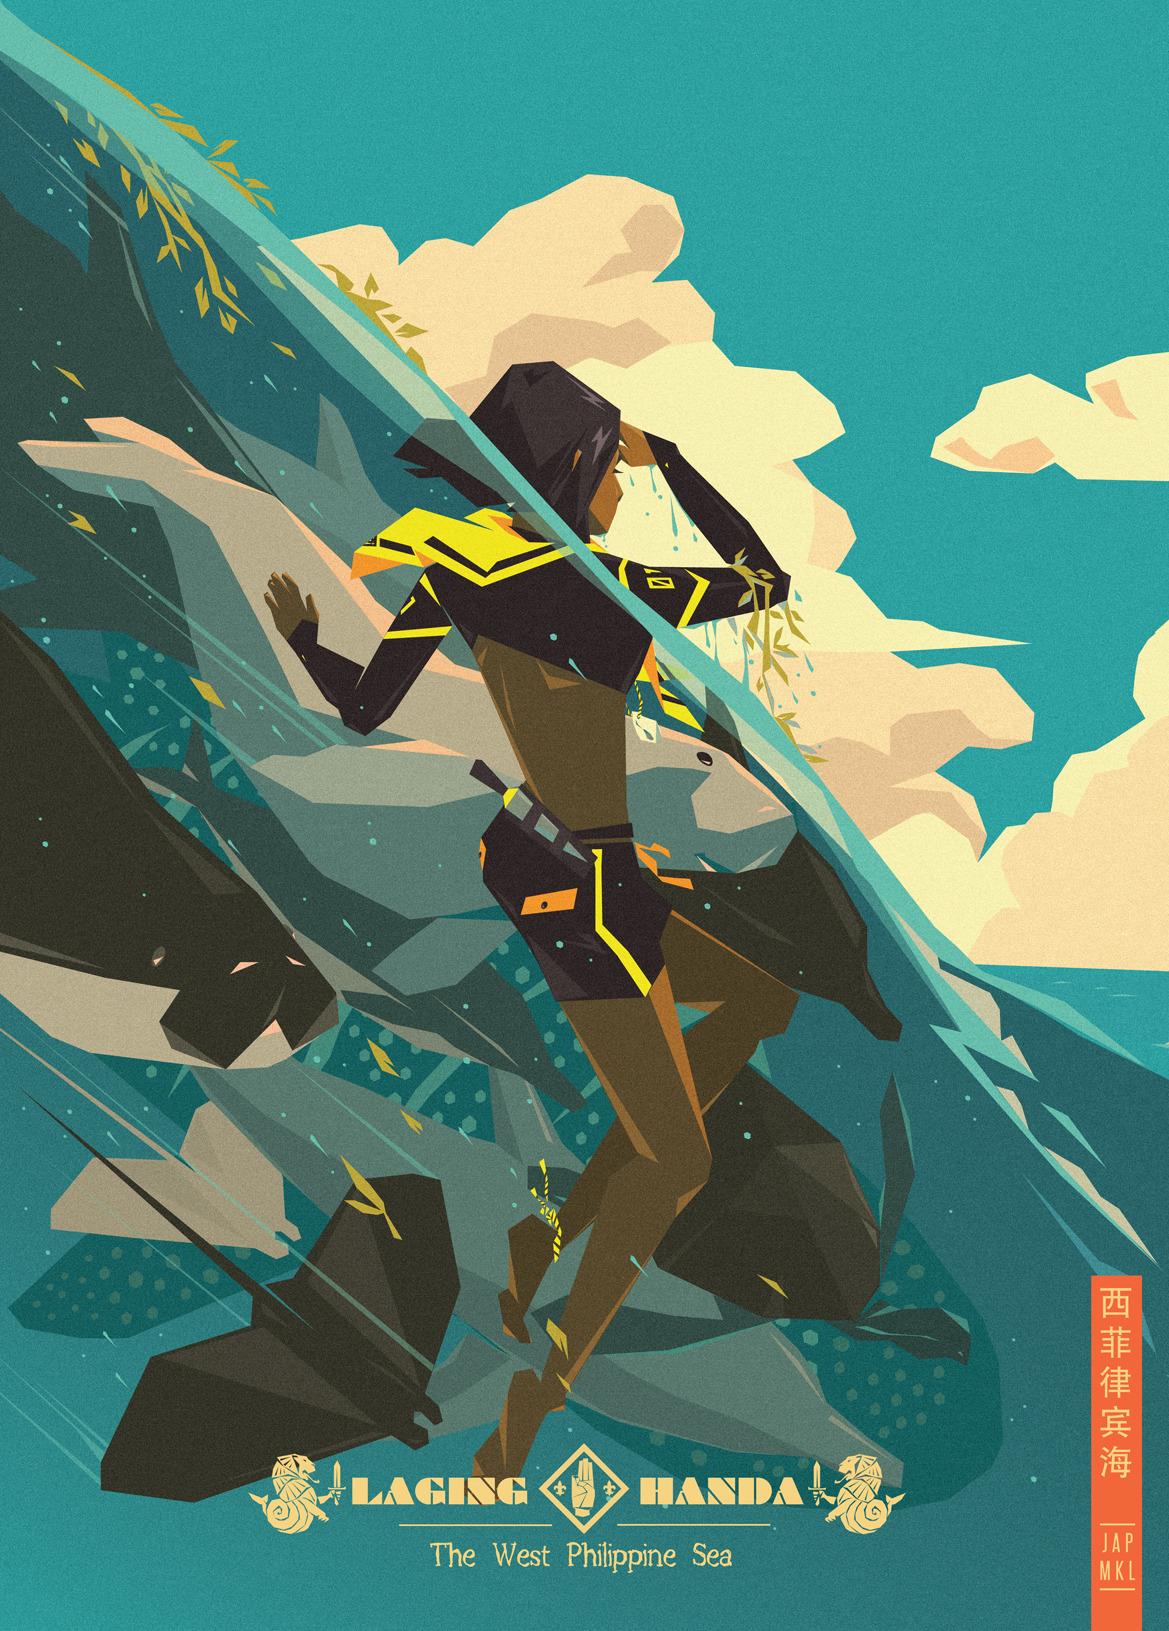 Jap Mkl The Ultramar Leones Troop West Philippine Sea